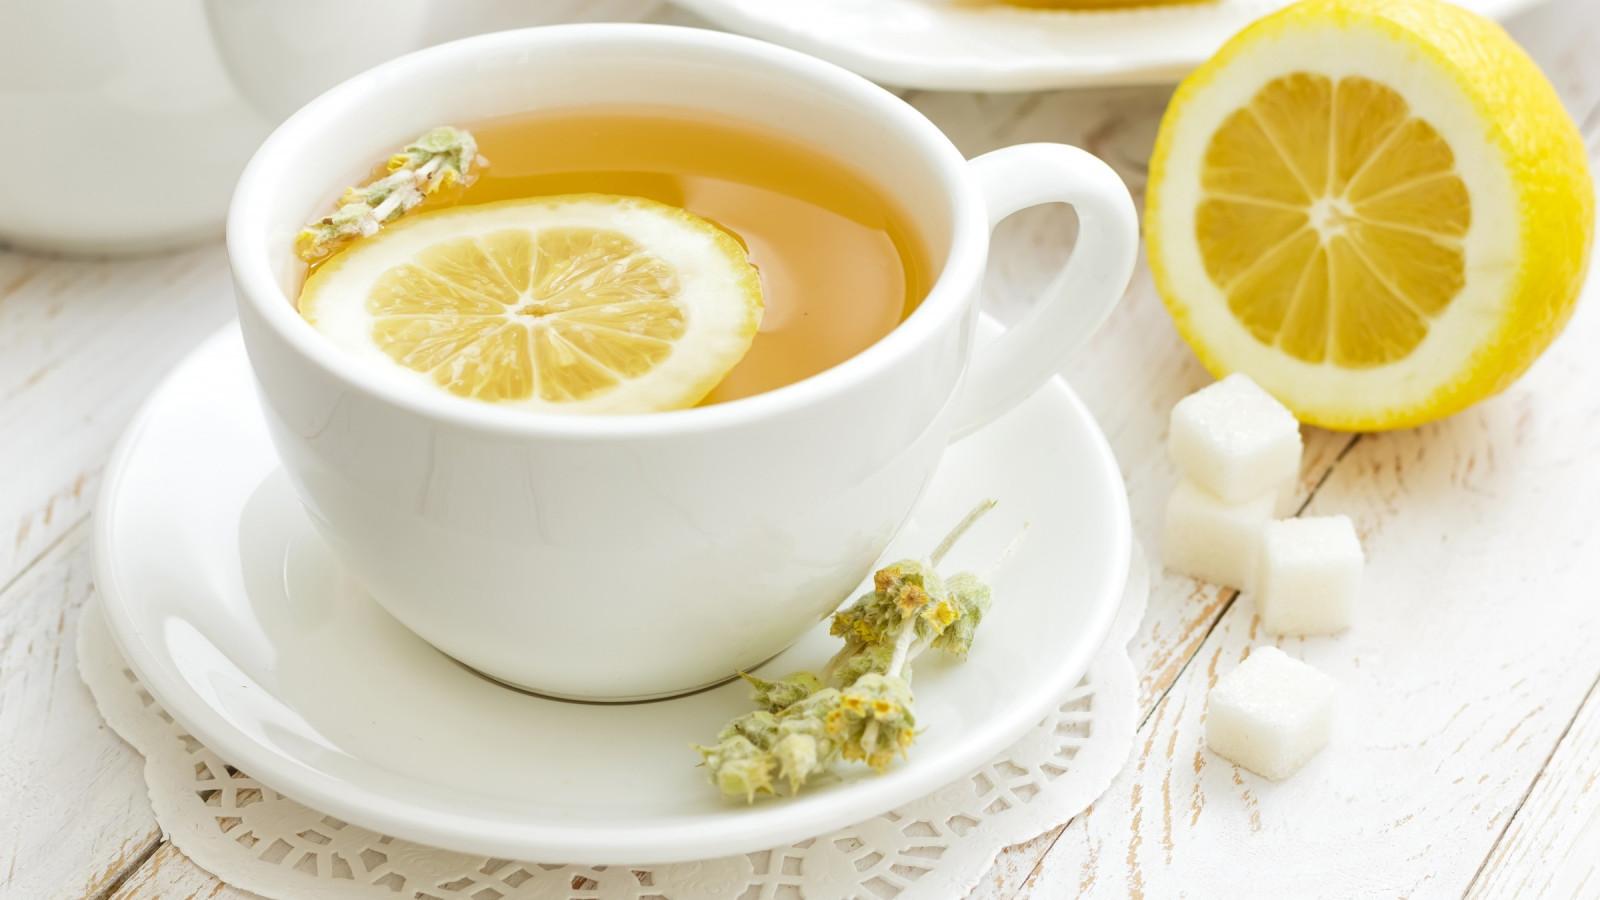 food, fruit, sugar, drink, tea, breakfast, lemons, citrus, plant, lemon, meal, 2400x1350 px, dish, produce, land plant, flowering plant, flavor